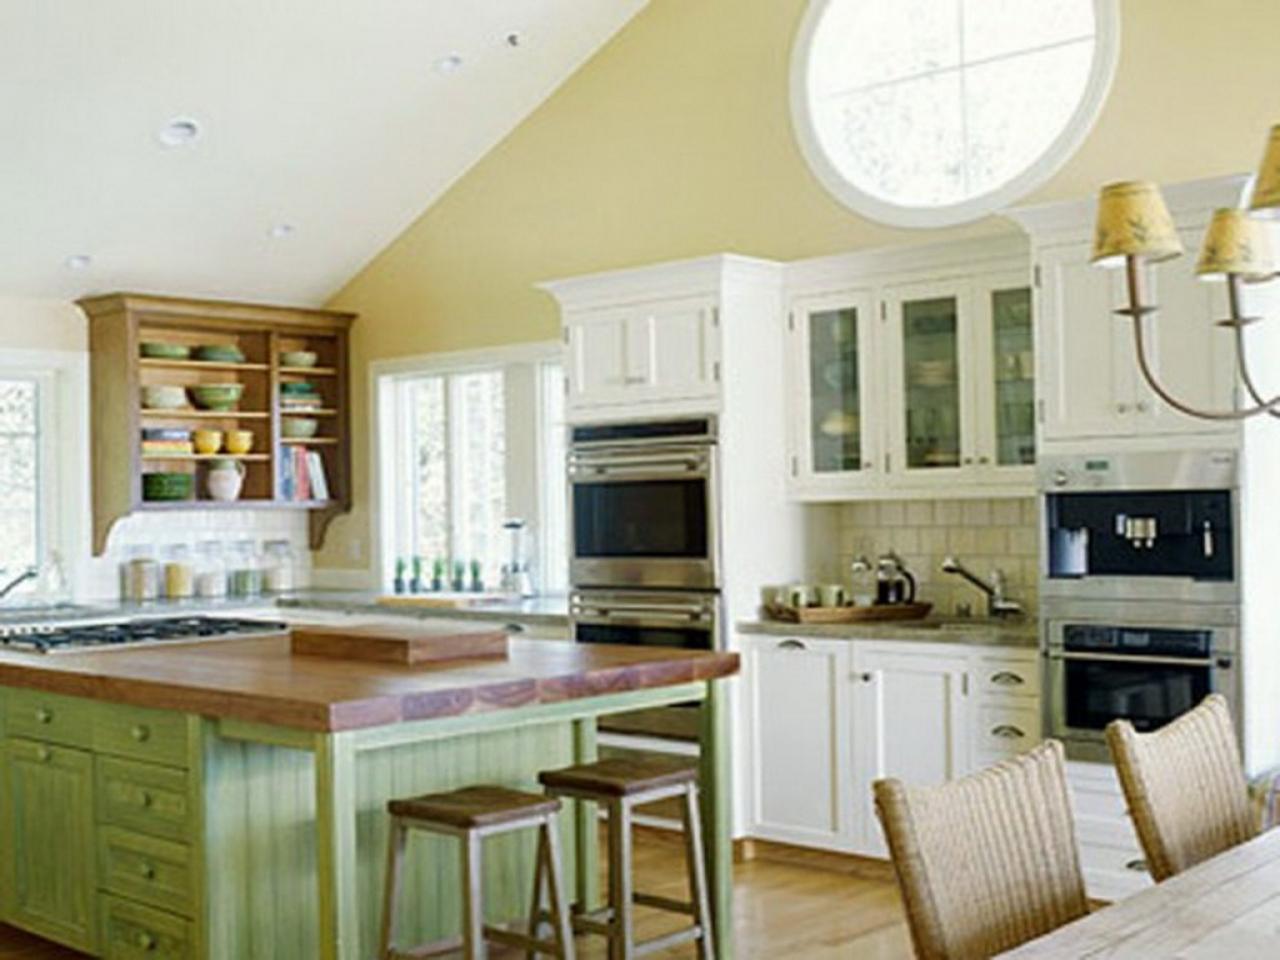 designing ideas for kitchen interiors - Designing Ideas